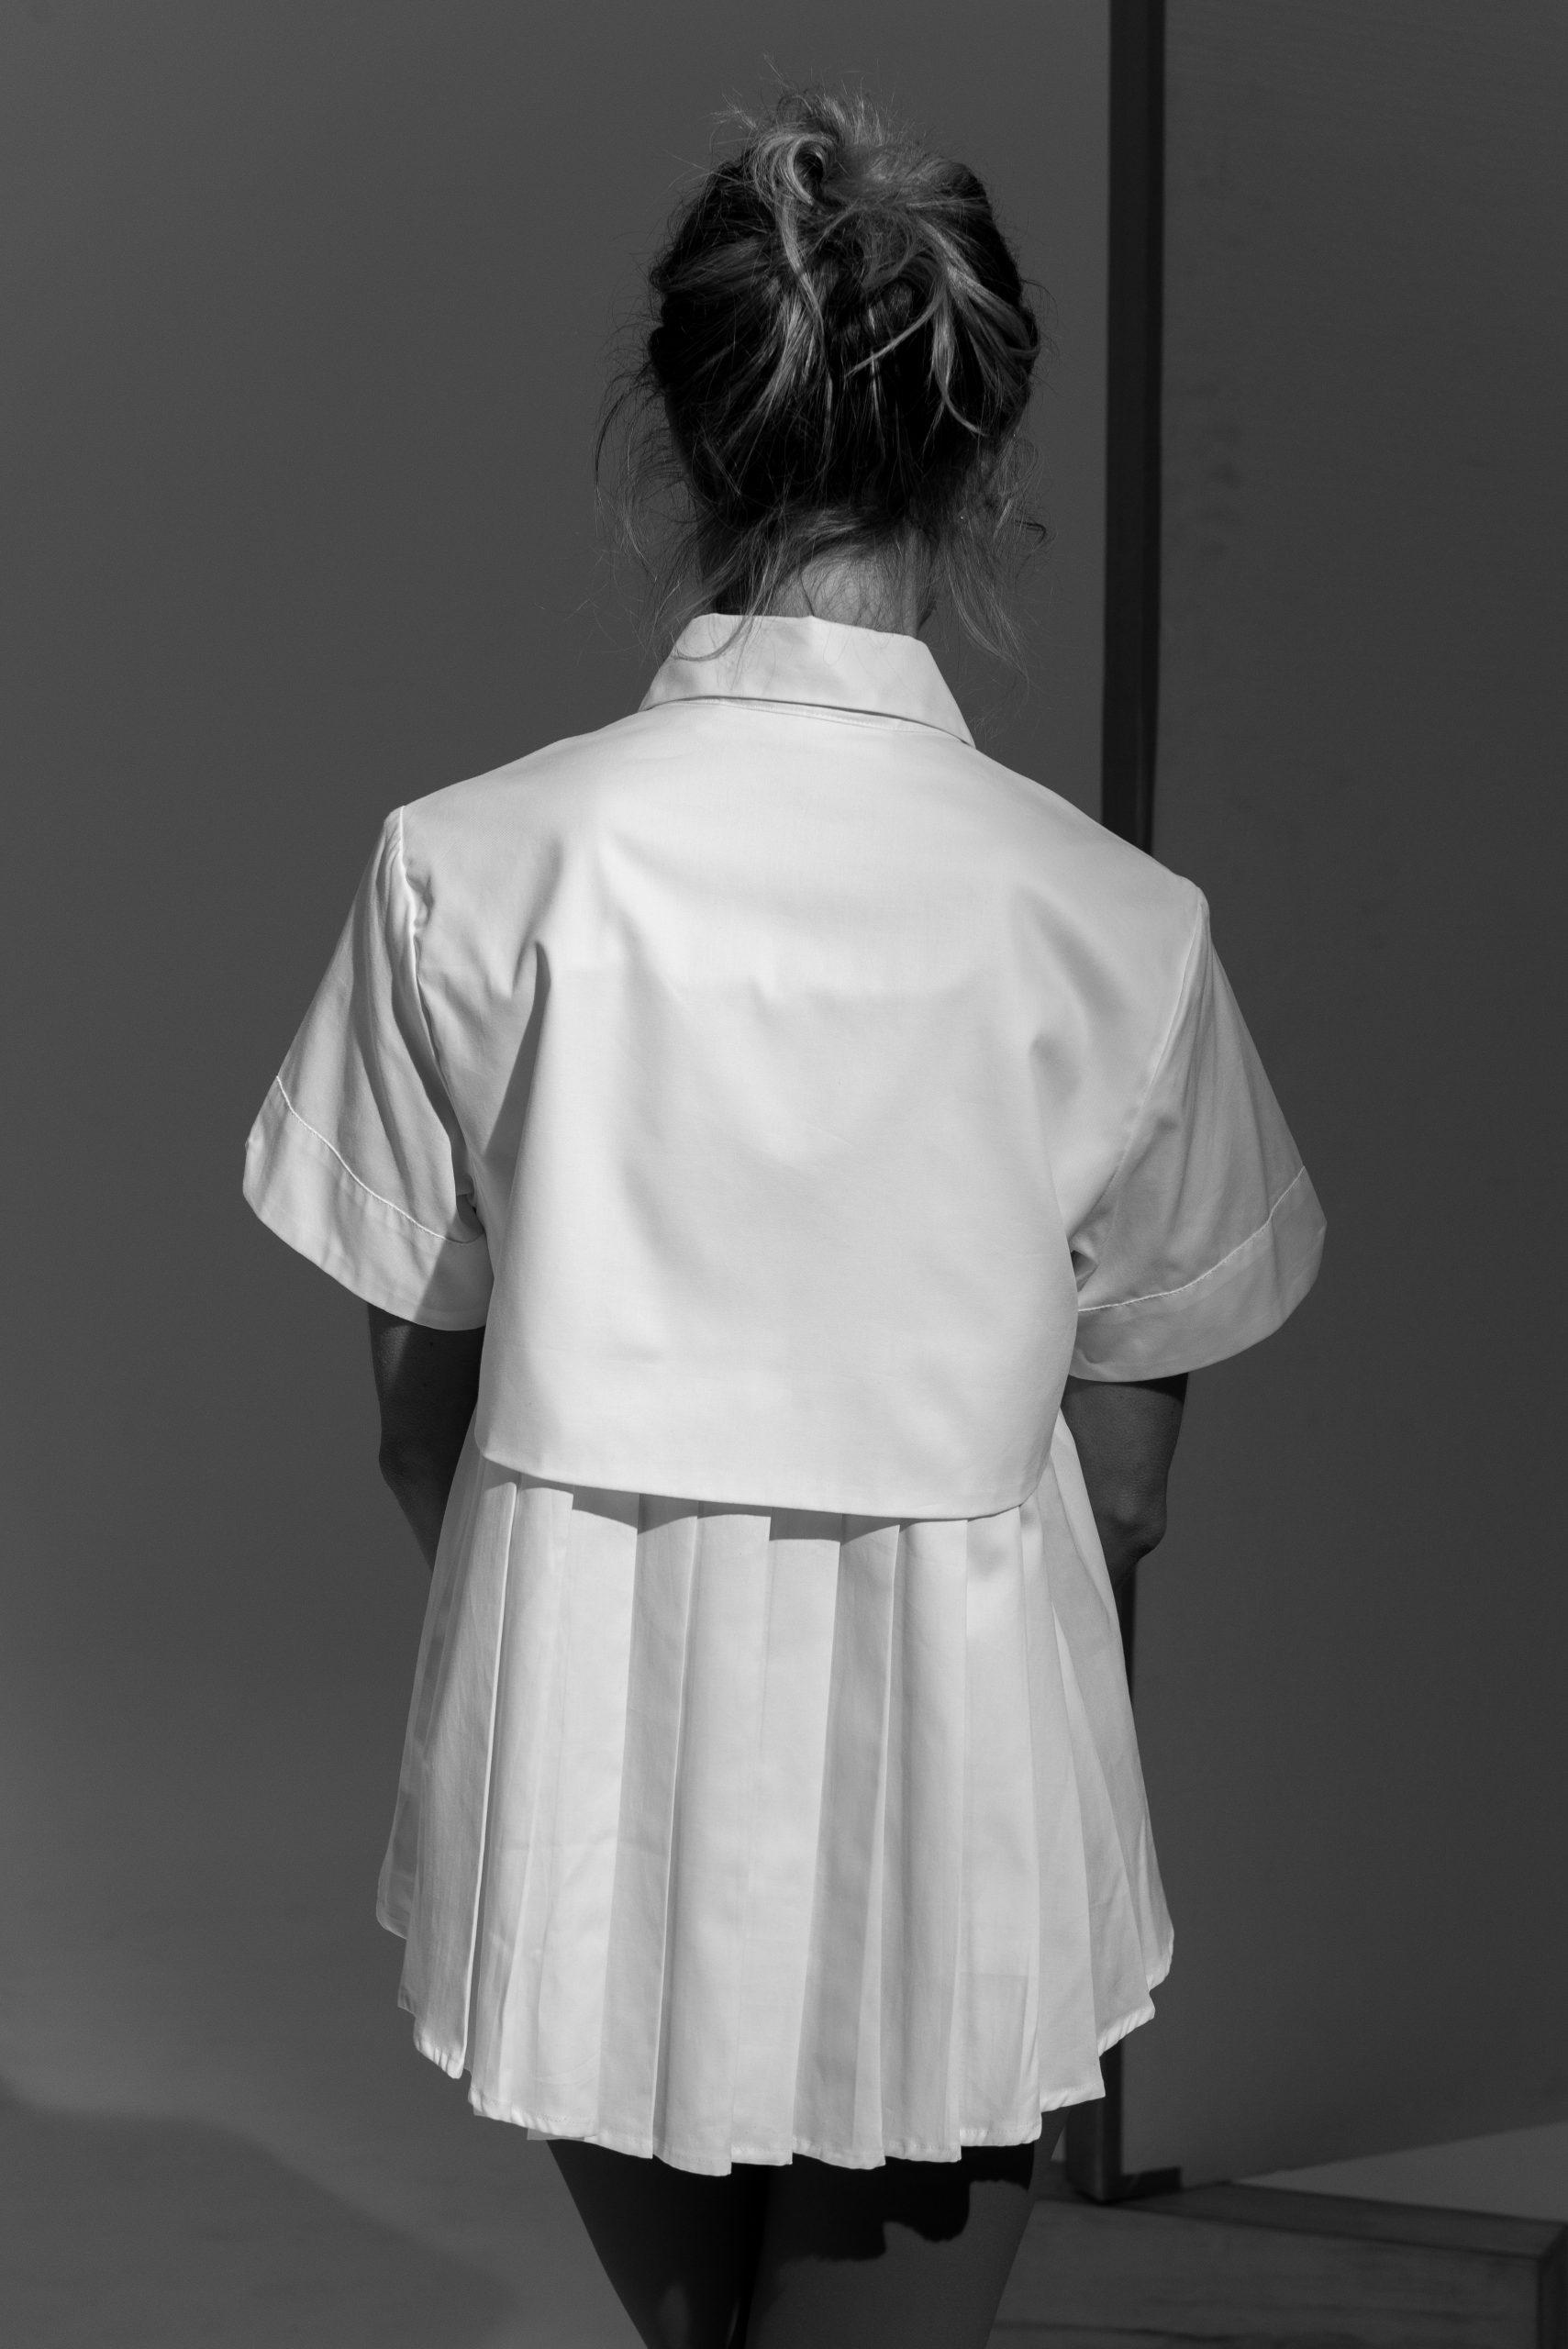 ropa-camisa-149-the-shitlab-atizz (2)